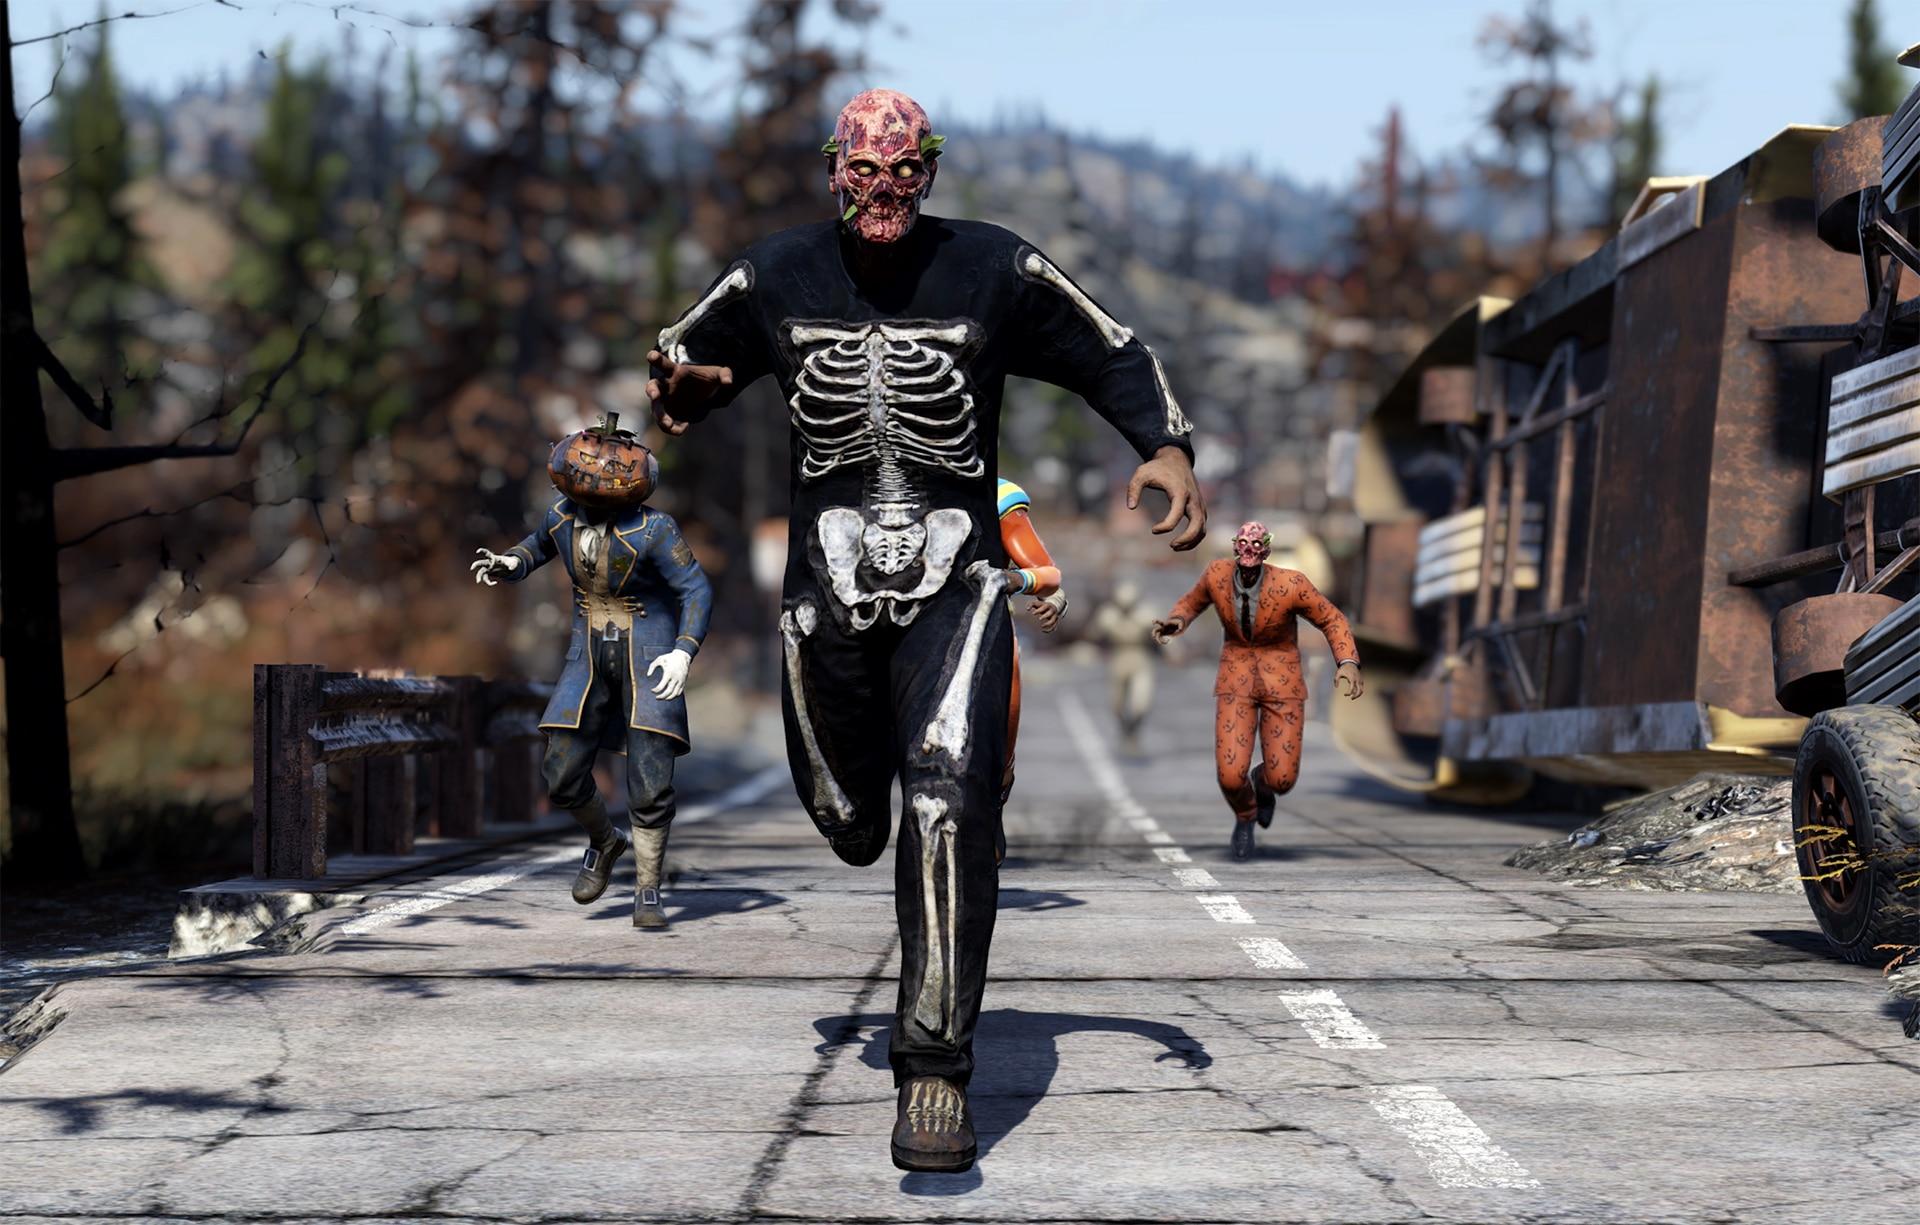 fallout 76 update 1.58